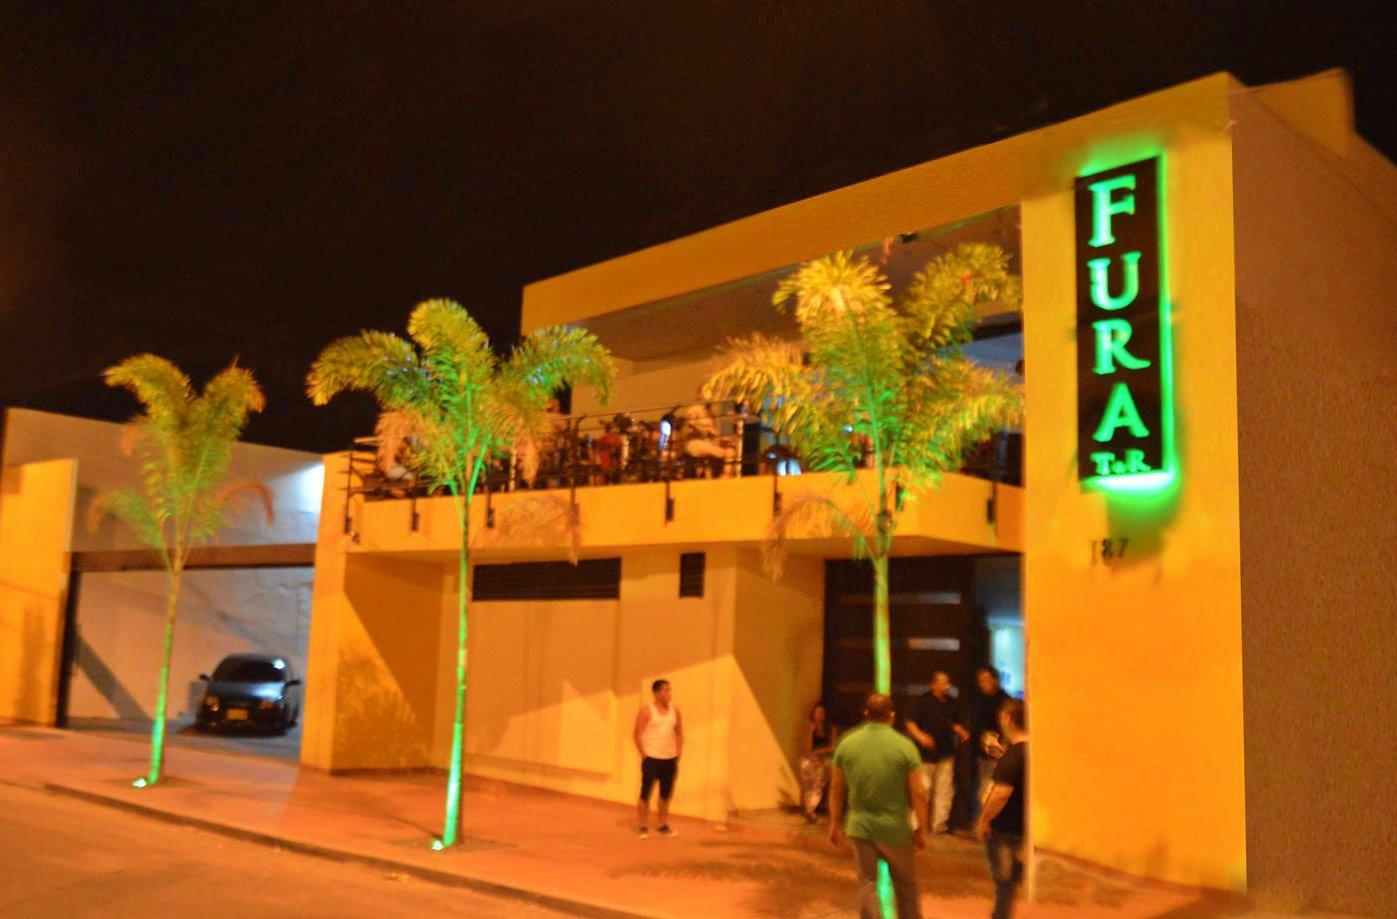 Discoteca Fura en Girardot